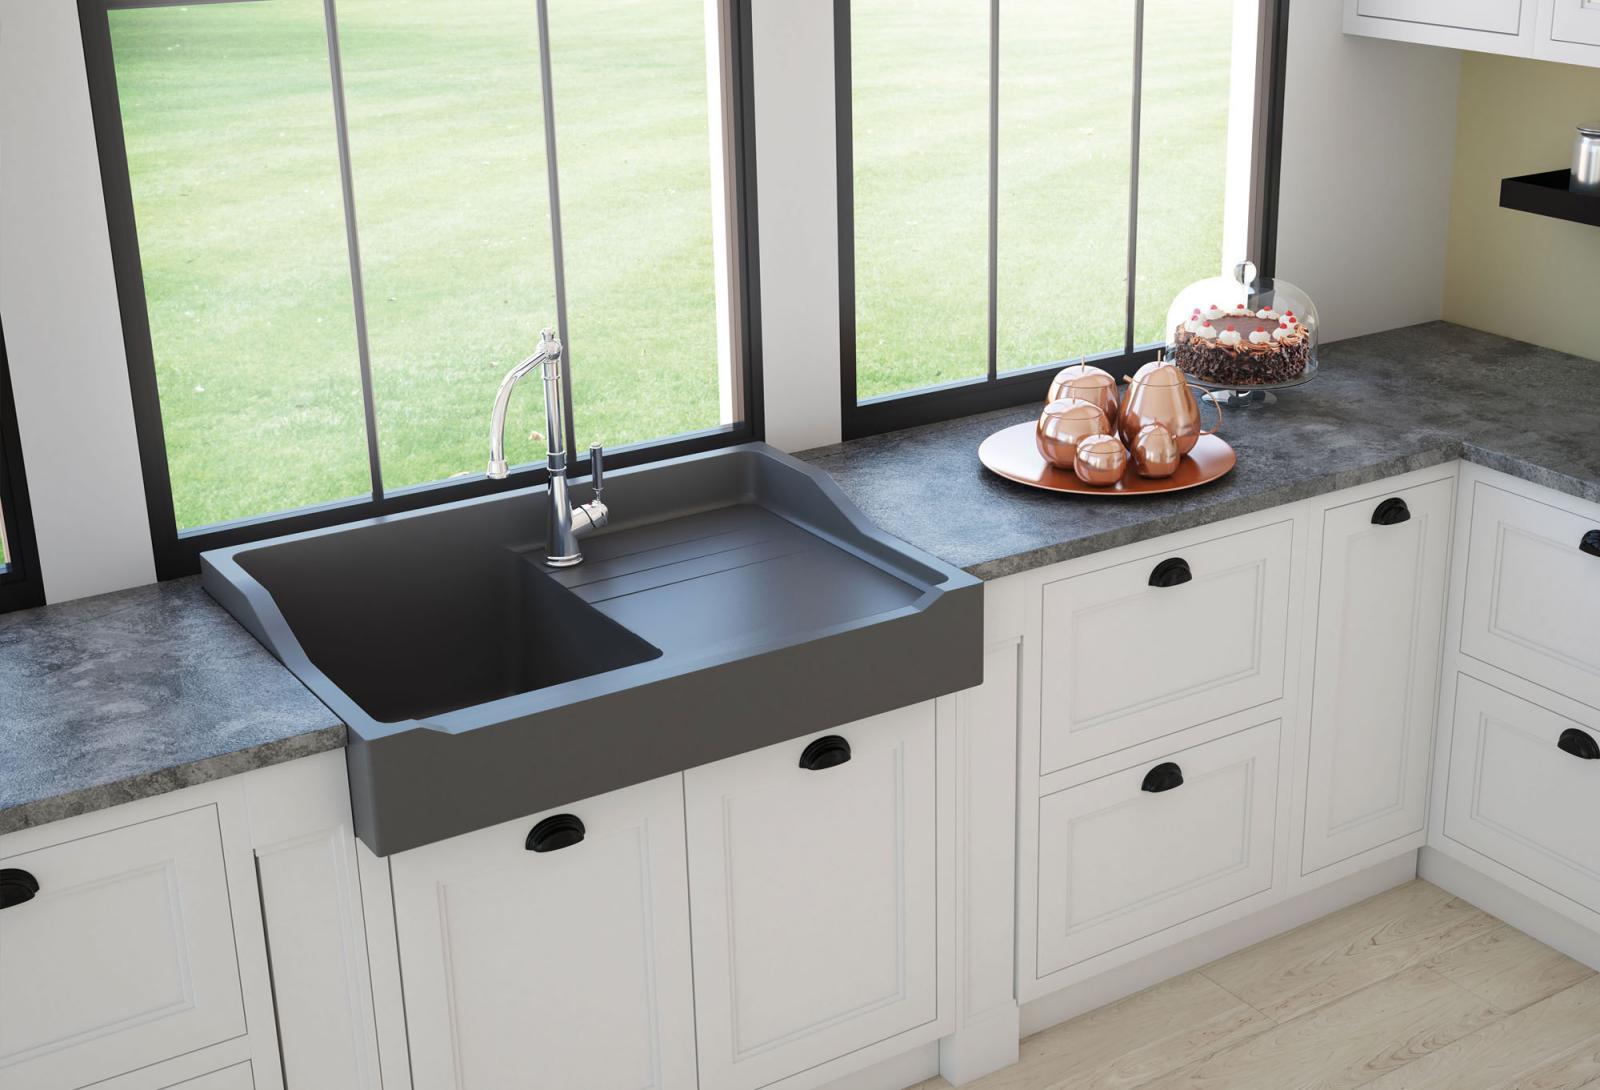 High-quality sink François 1er granit titanium gray - one bowl ambiente